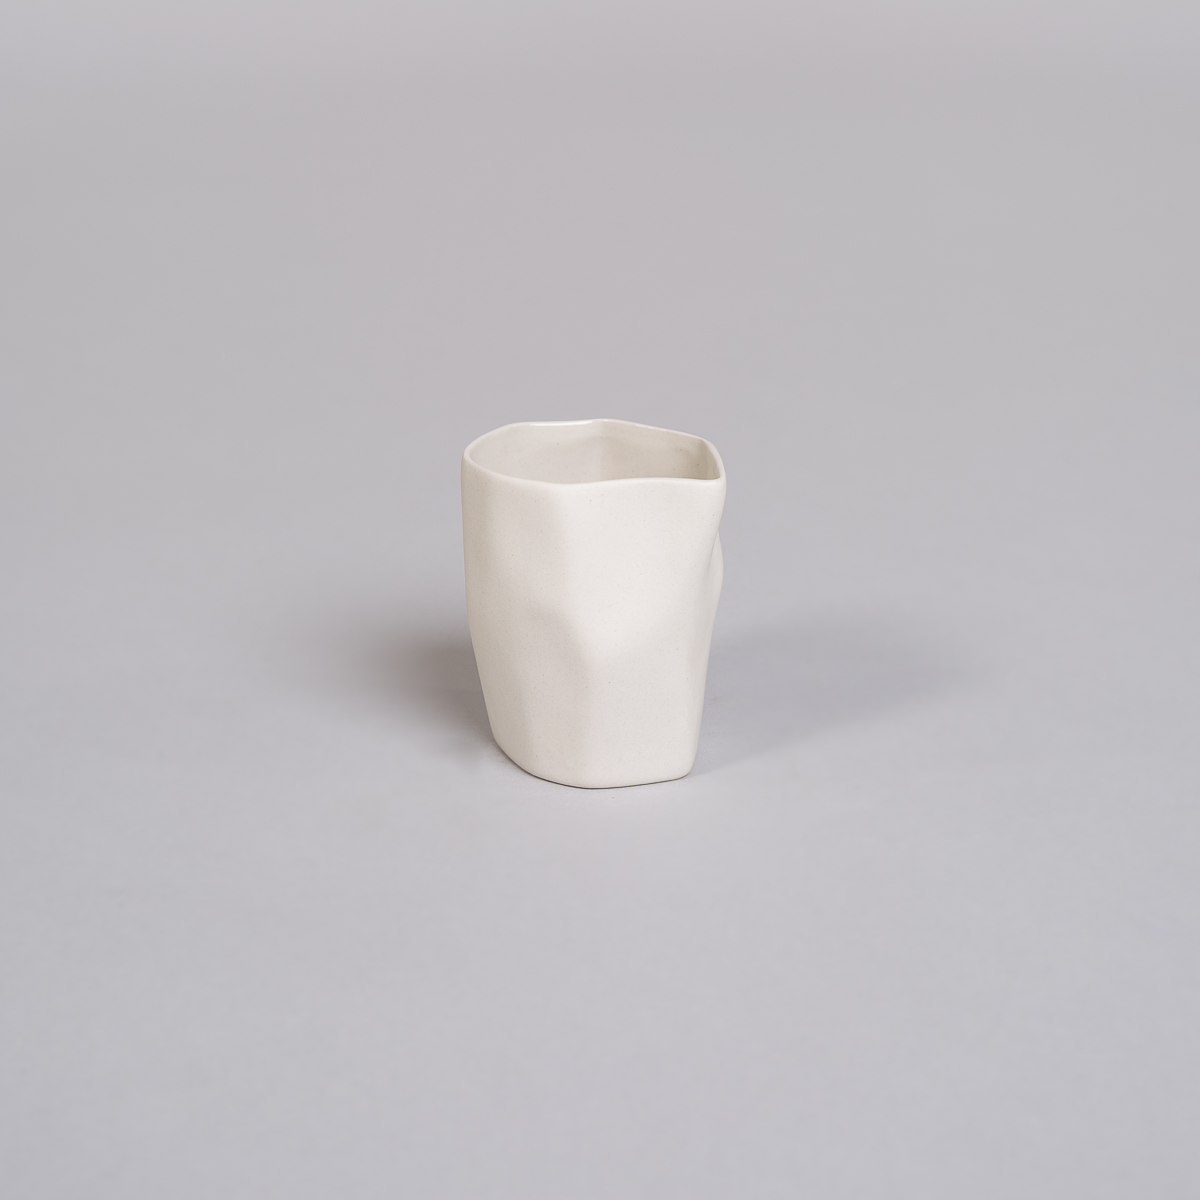 Fløte Mugge i Porselen - Kremfarget-0